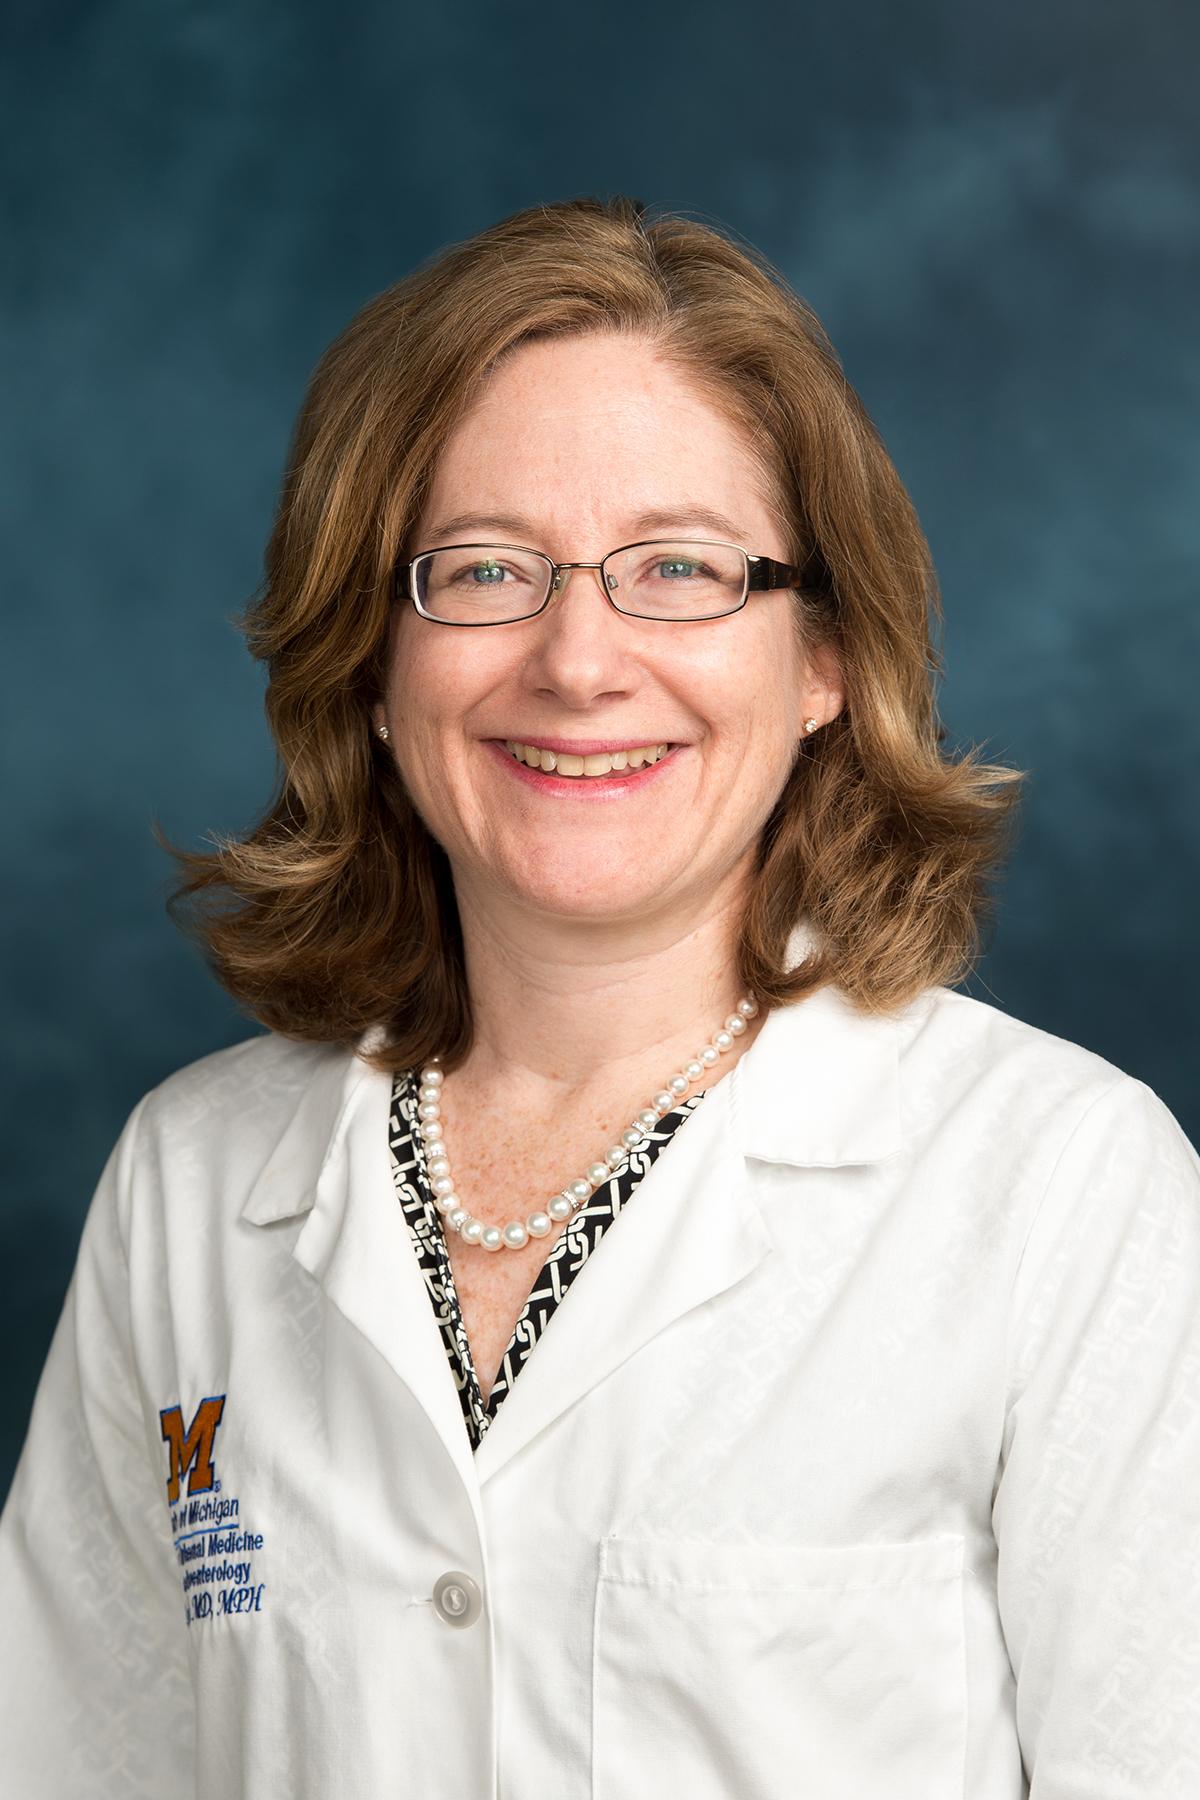 Elena Stoffel, MD, MPH